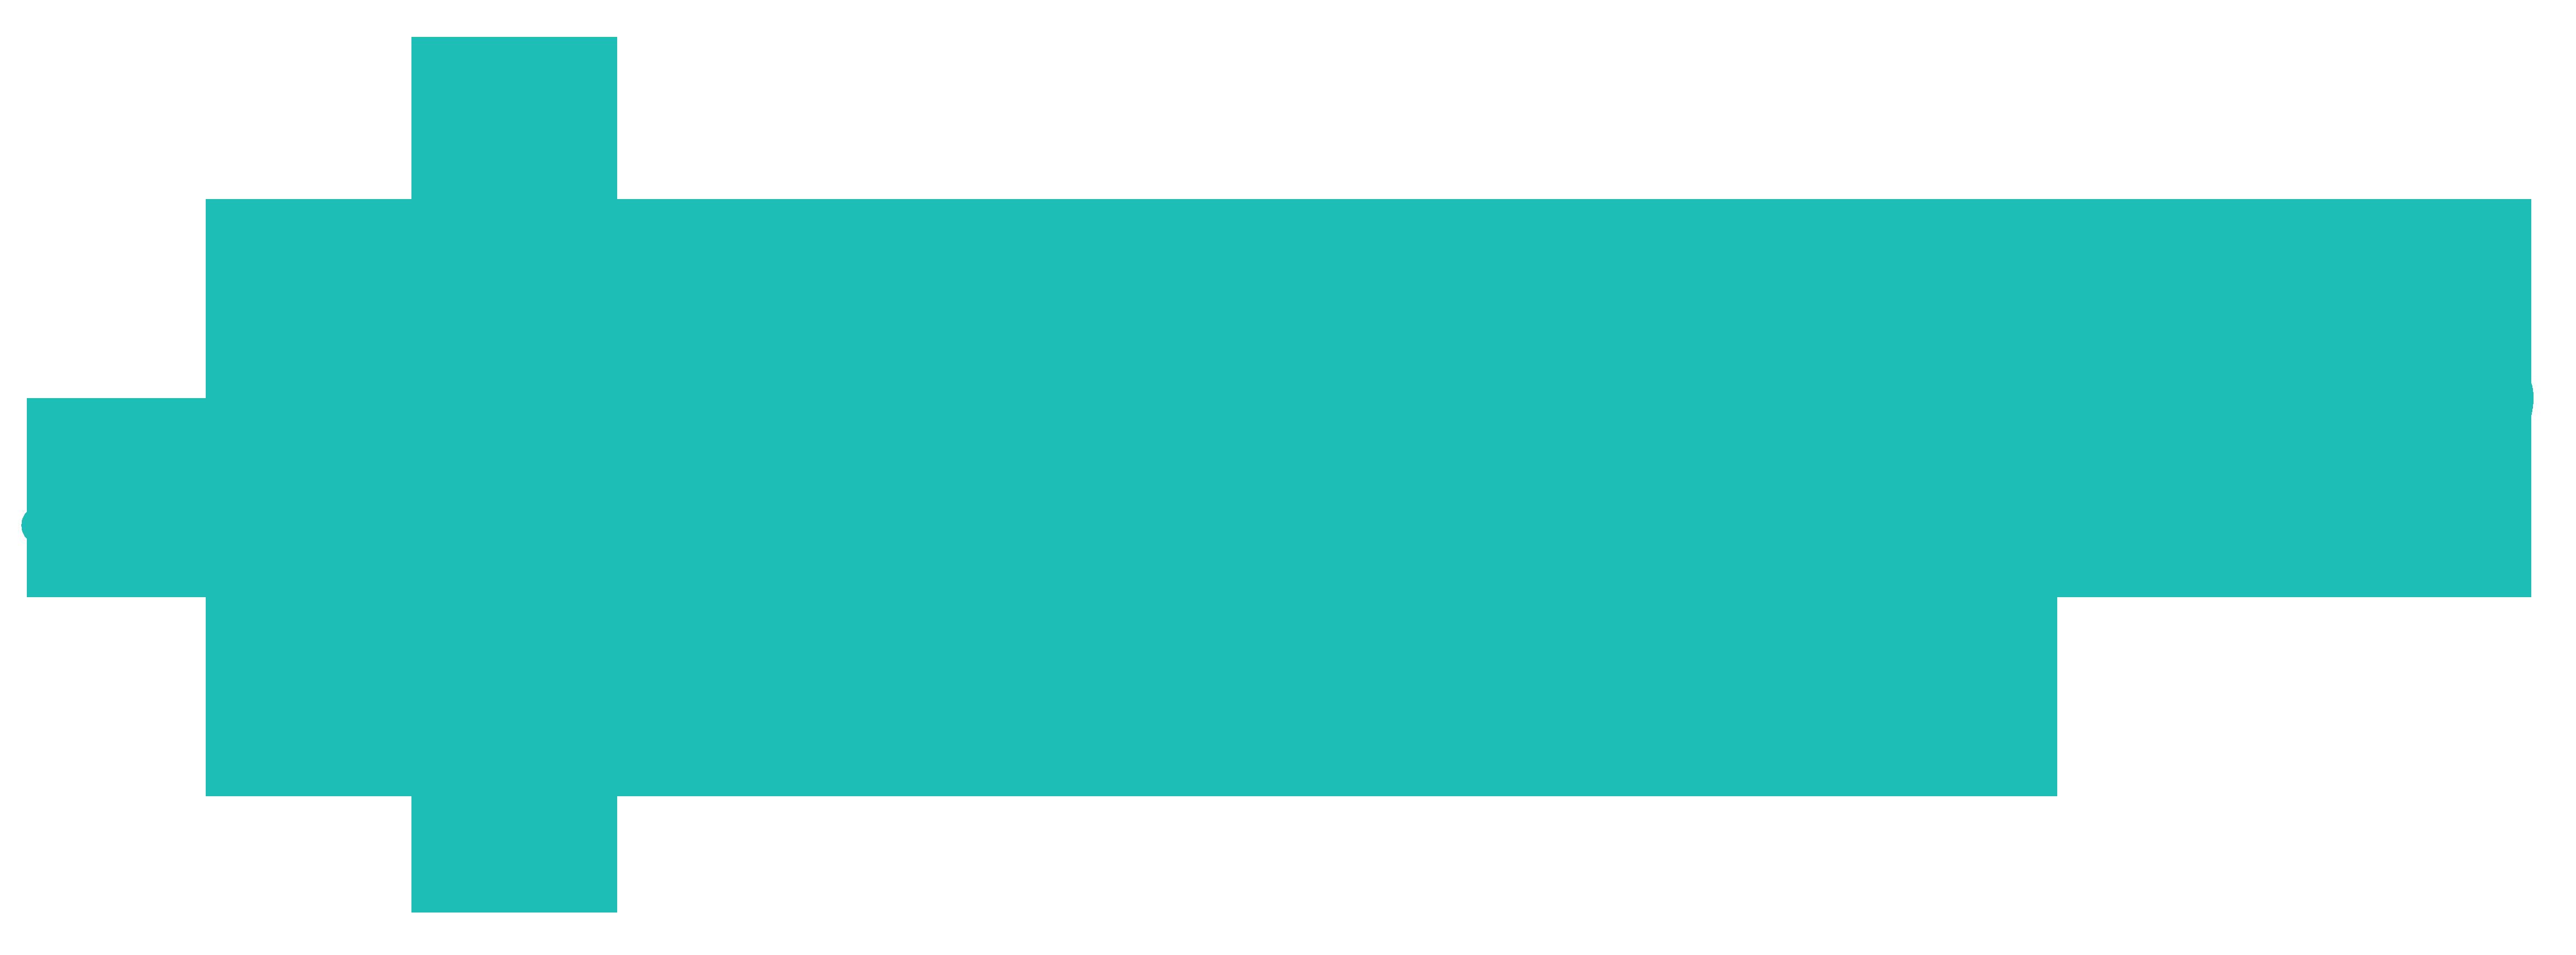 Awakening Church Online